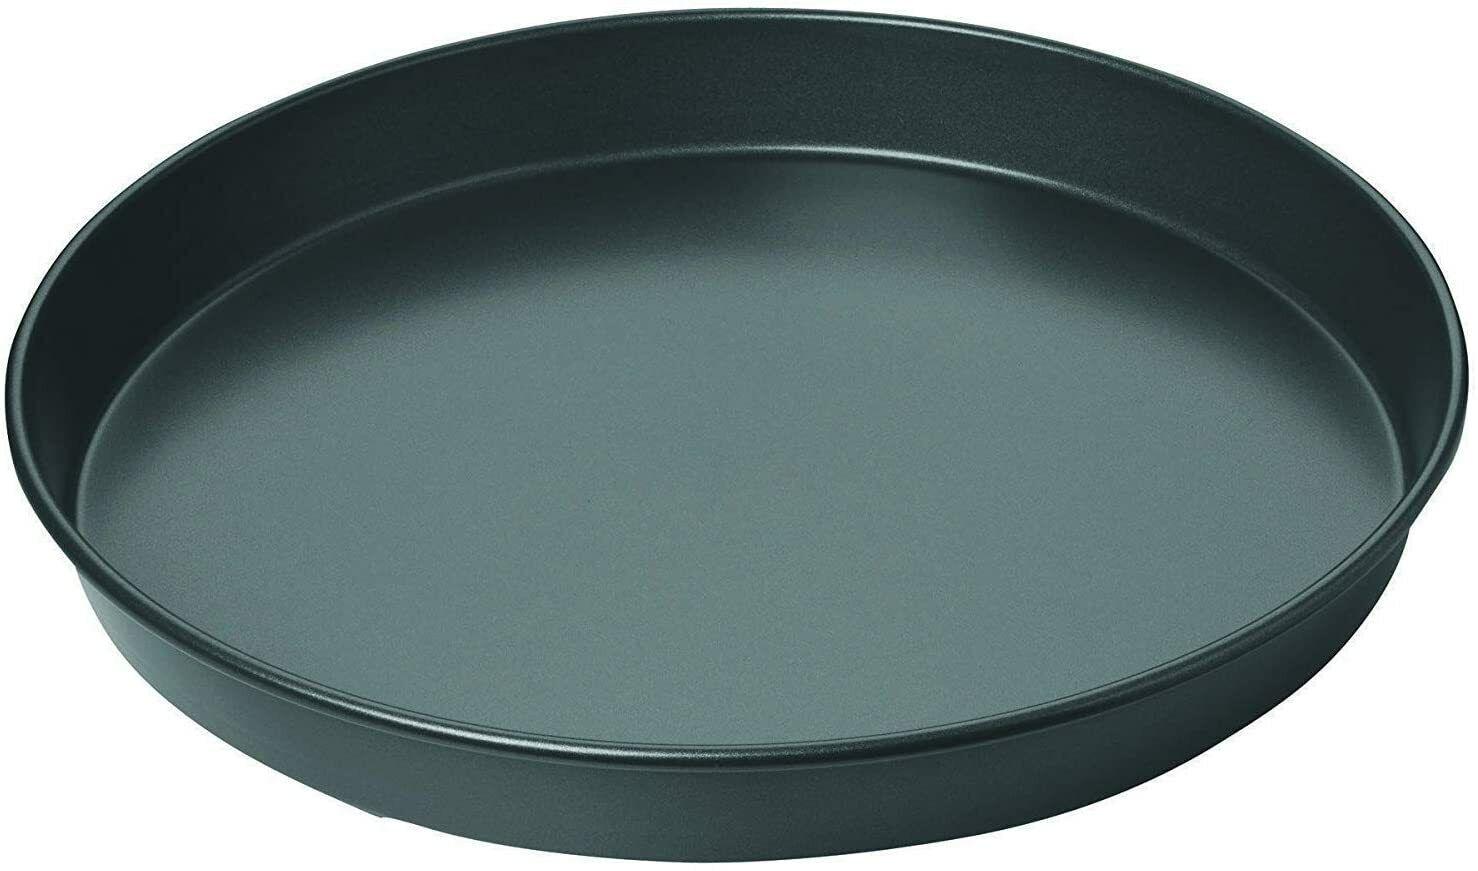 7-Inch 7 Pizza Pan Professional Premium Deep Dish Non-Stick Bakeware lYonge